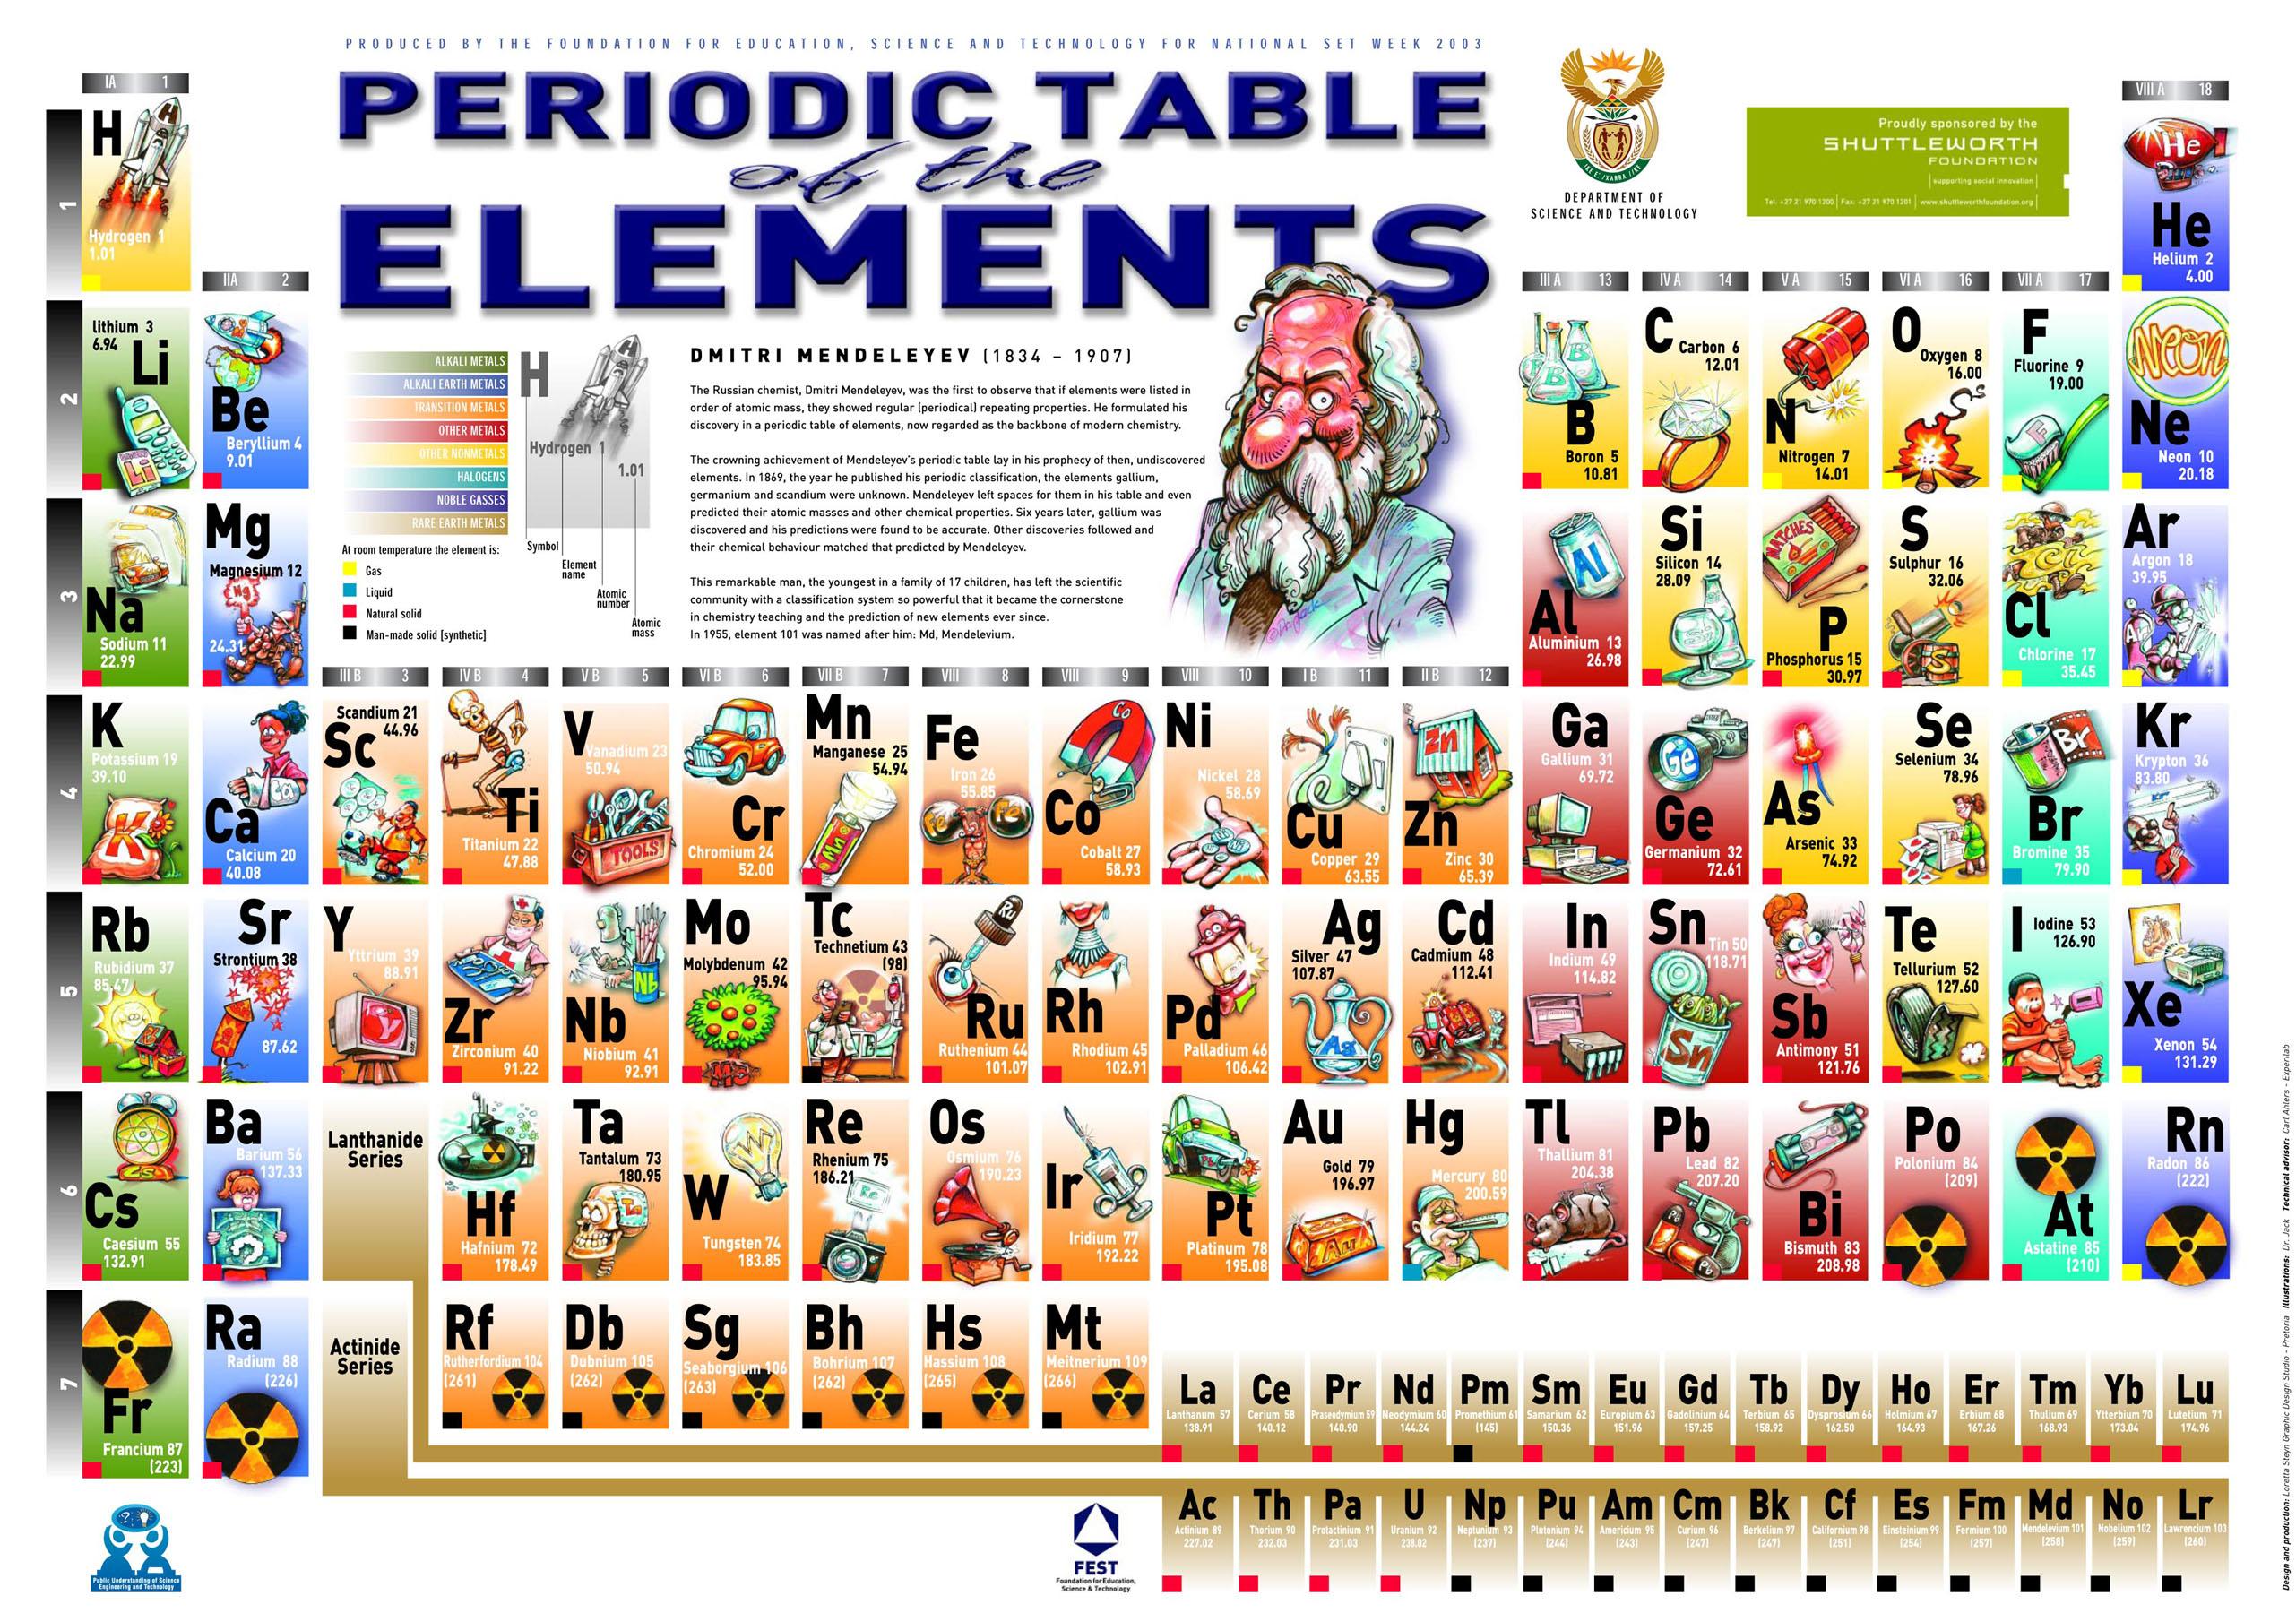 Fun And Interesting Periodic Table Spin Offs Kuriositas